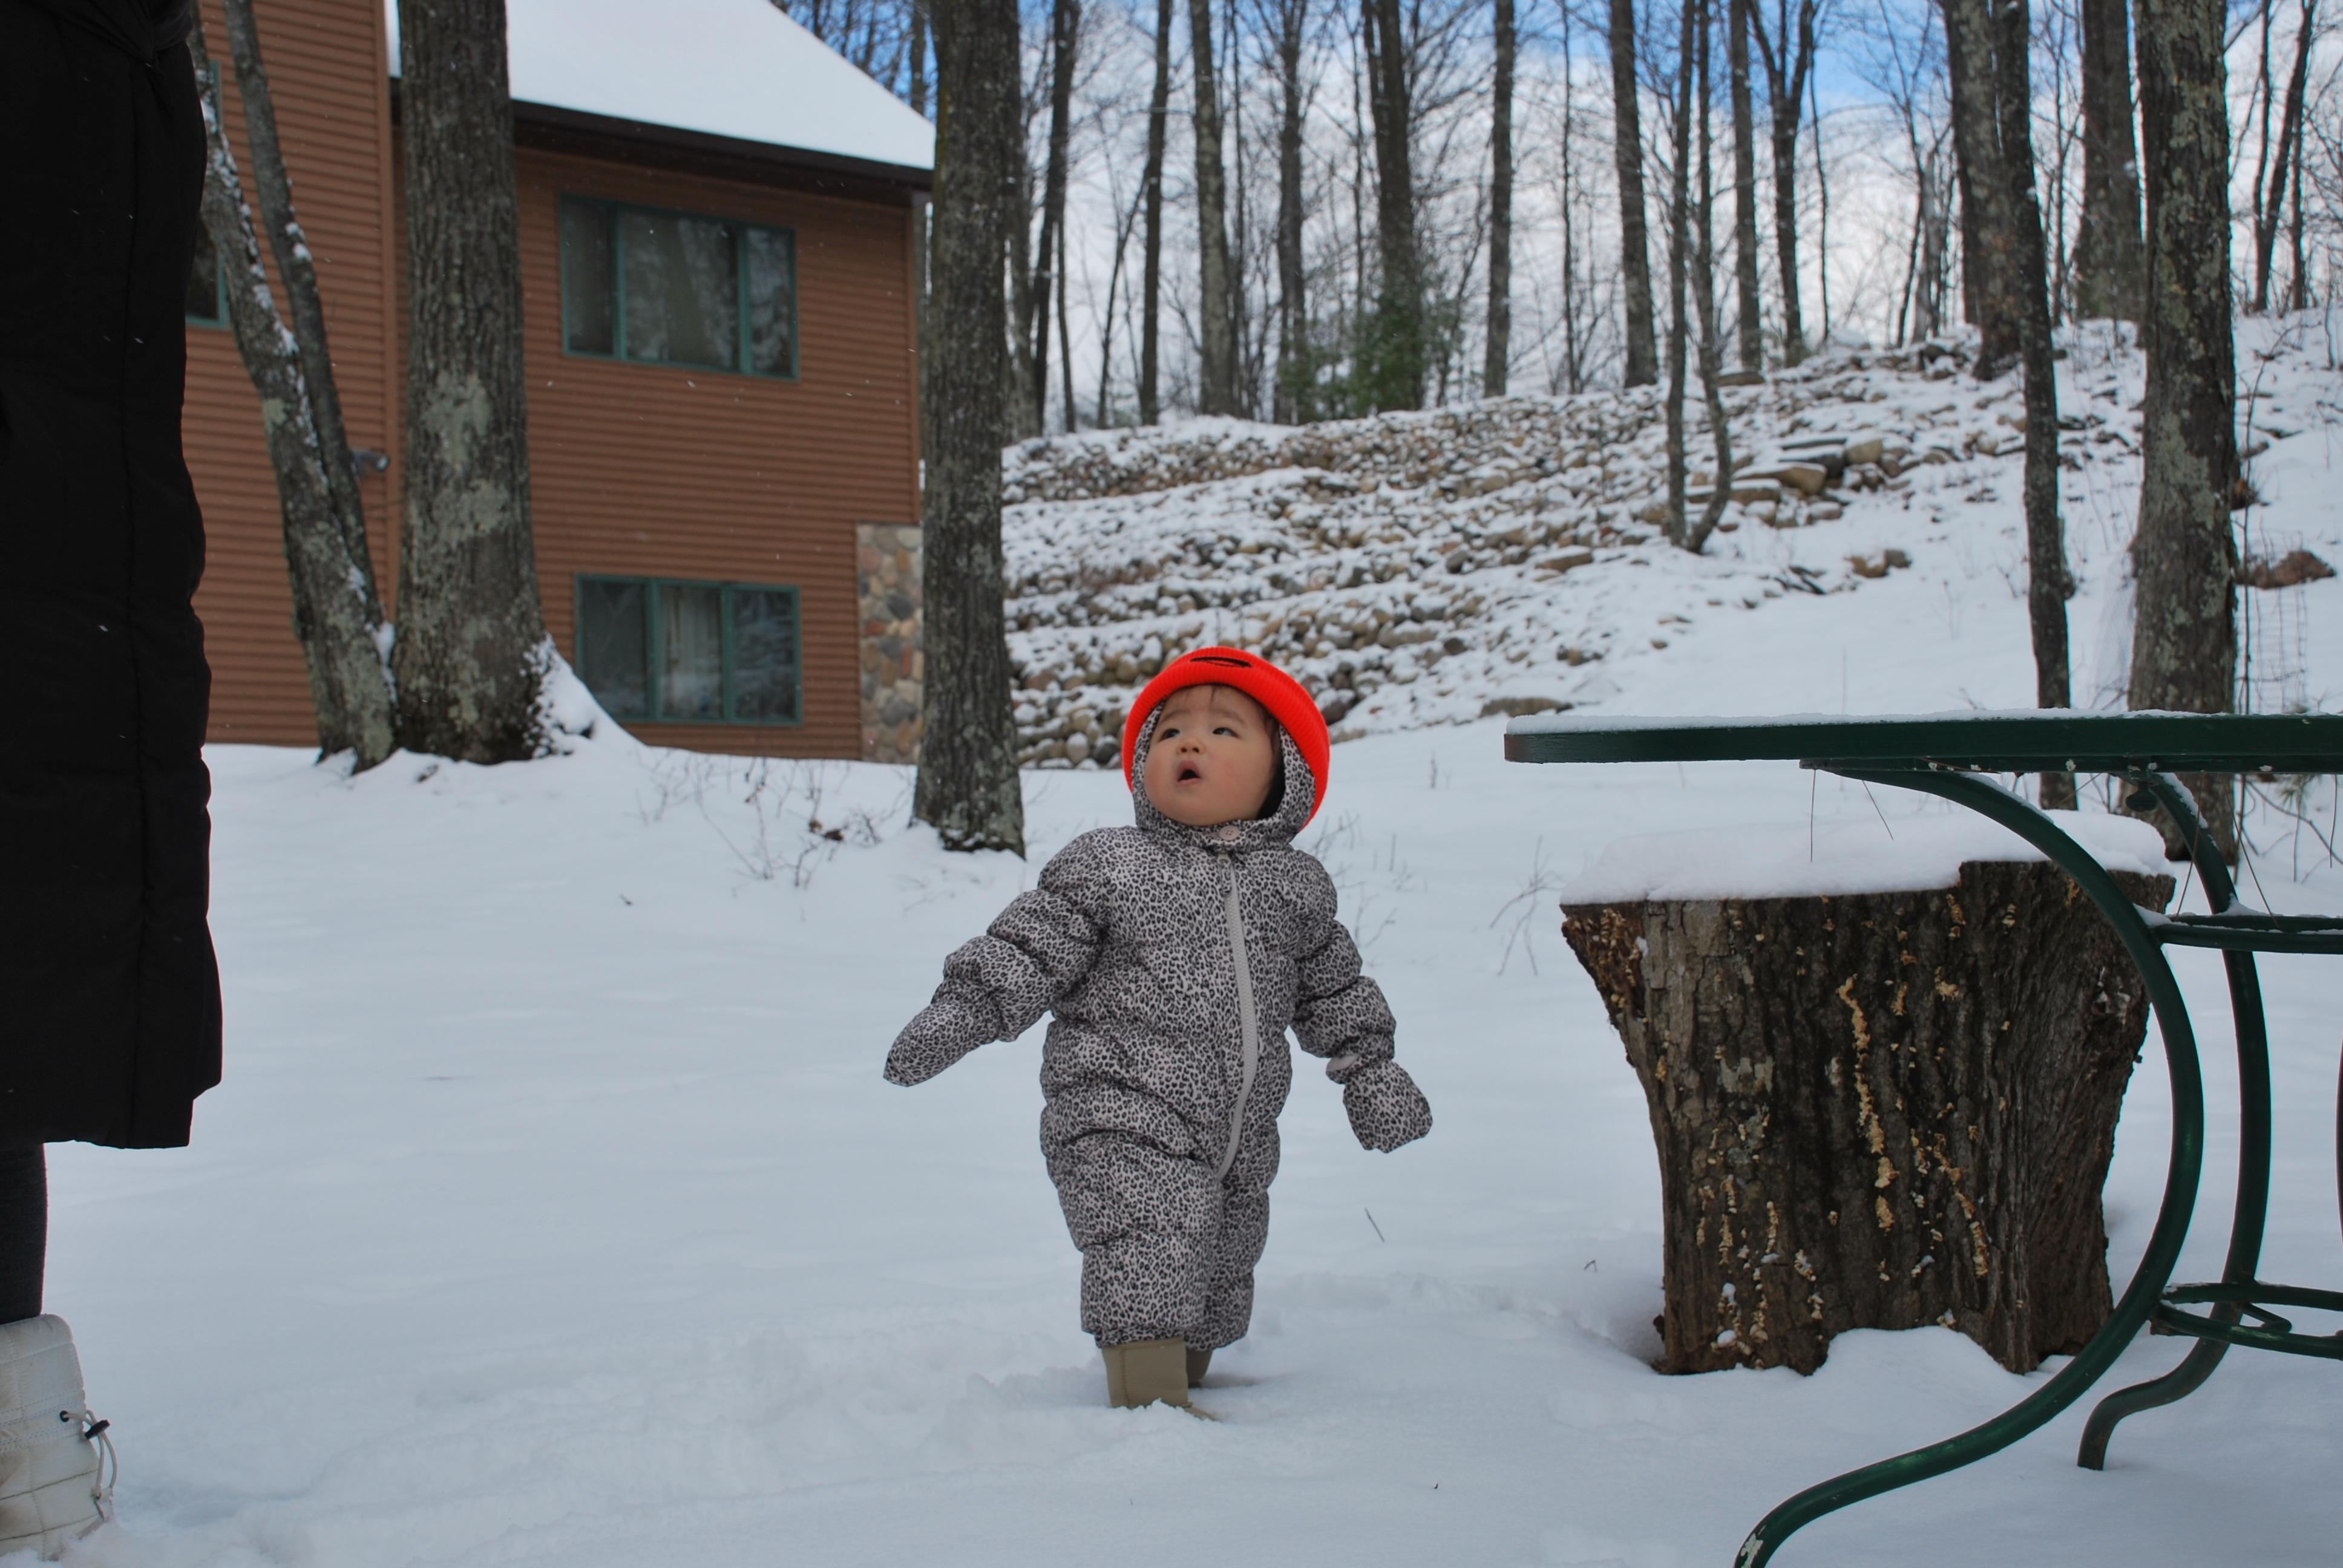 Gambar Outdoor Salju Musim Dingin Anak Imut Kecil Cuaca